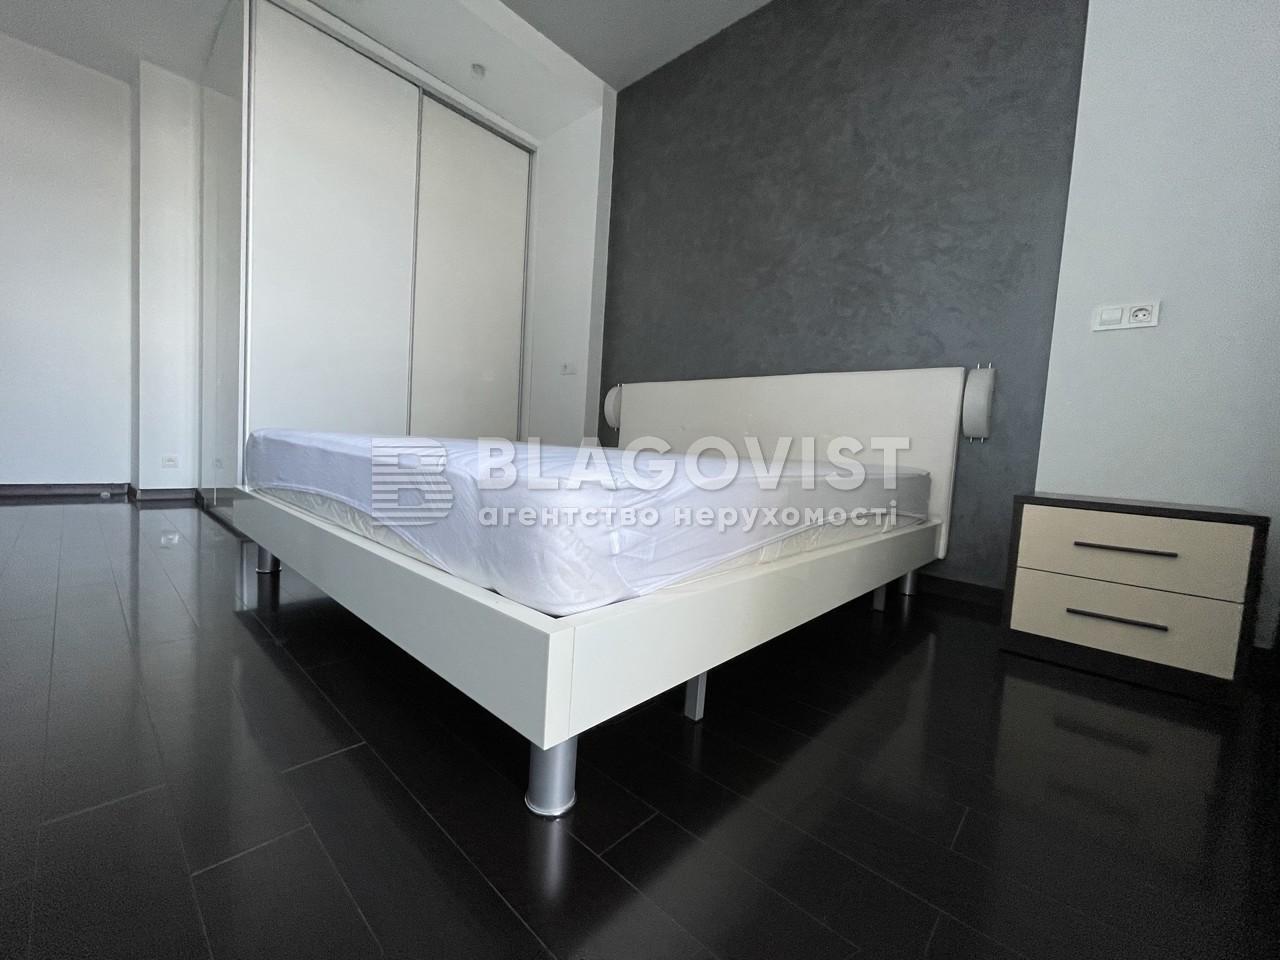 Квартира A-112442, Коновальца Евгения (Щорса), 44а, Киев - Фото 14